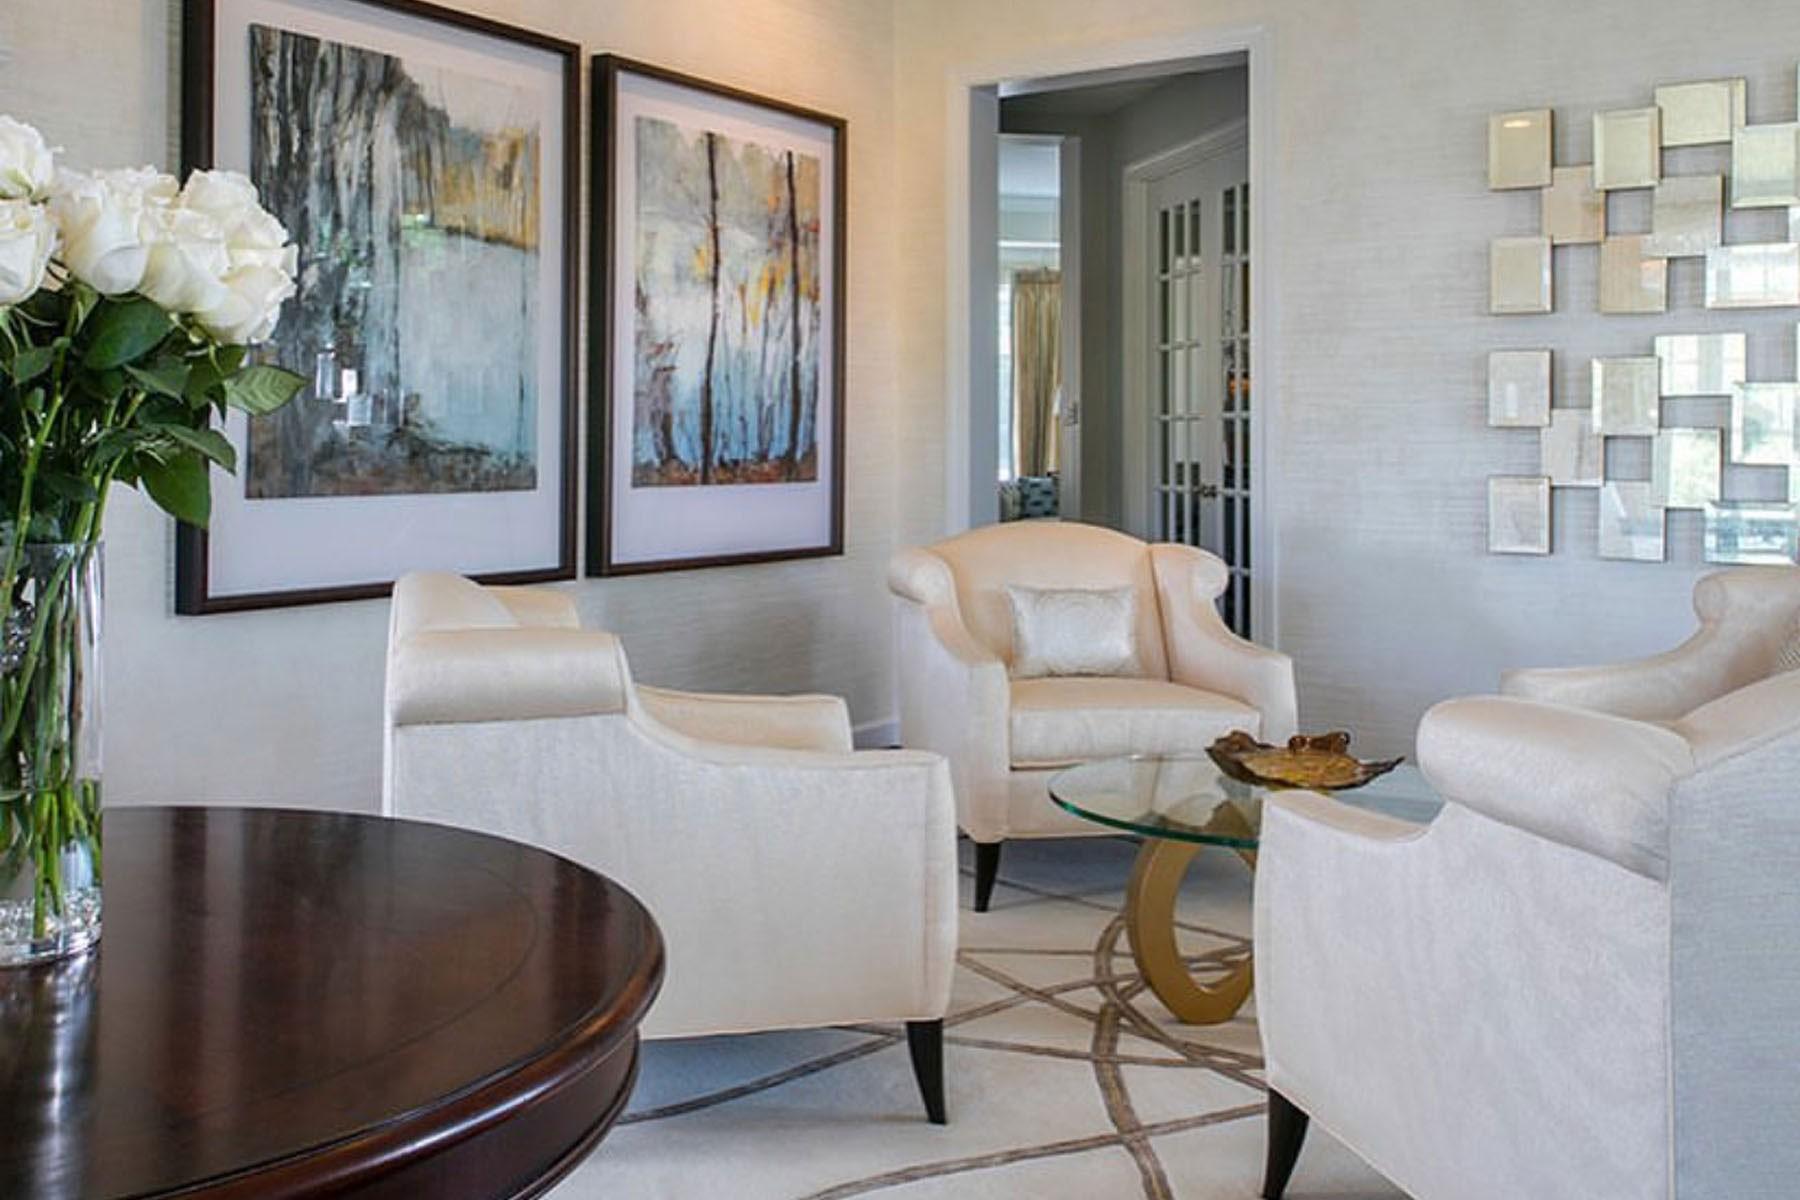 Coco Chair - Paula Grace Designs